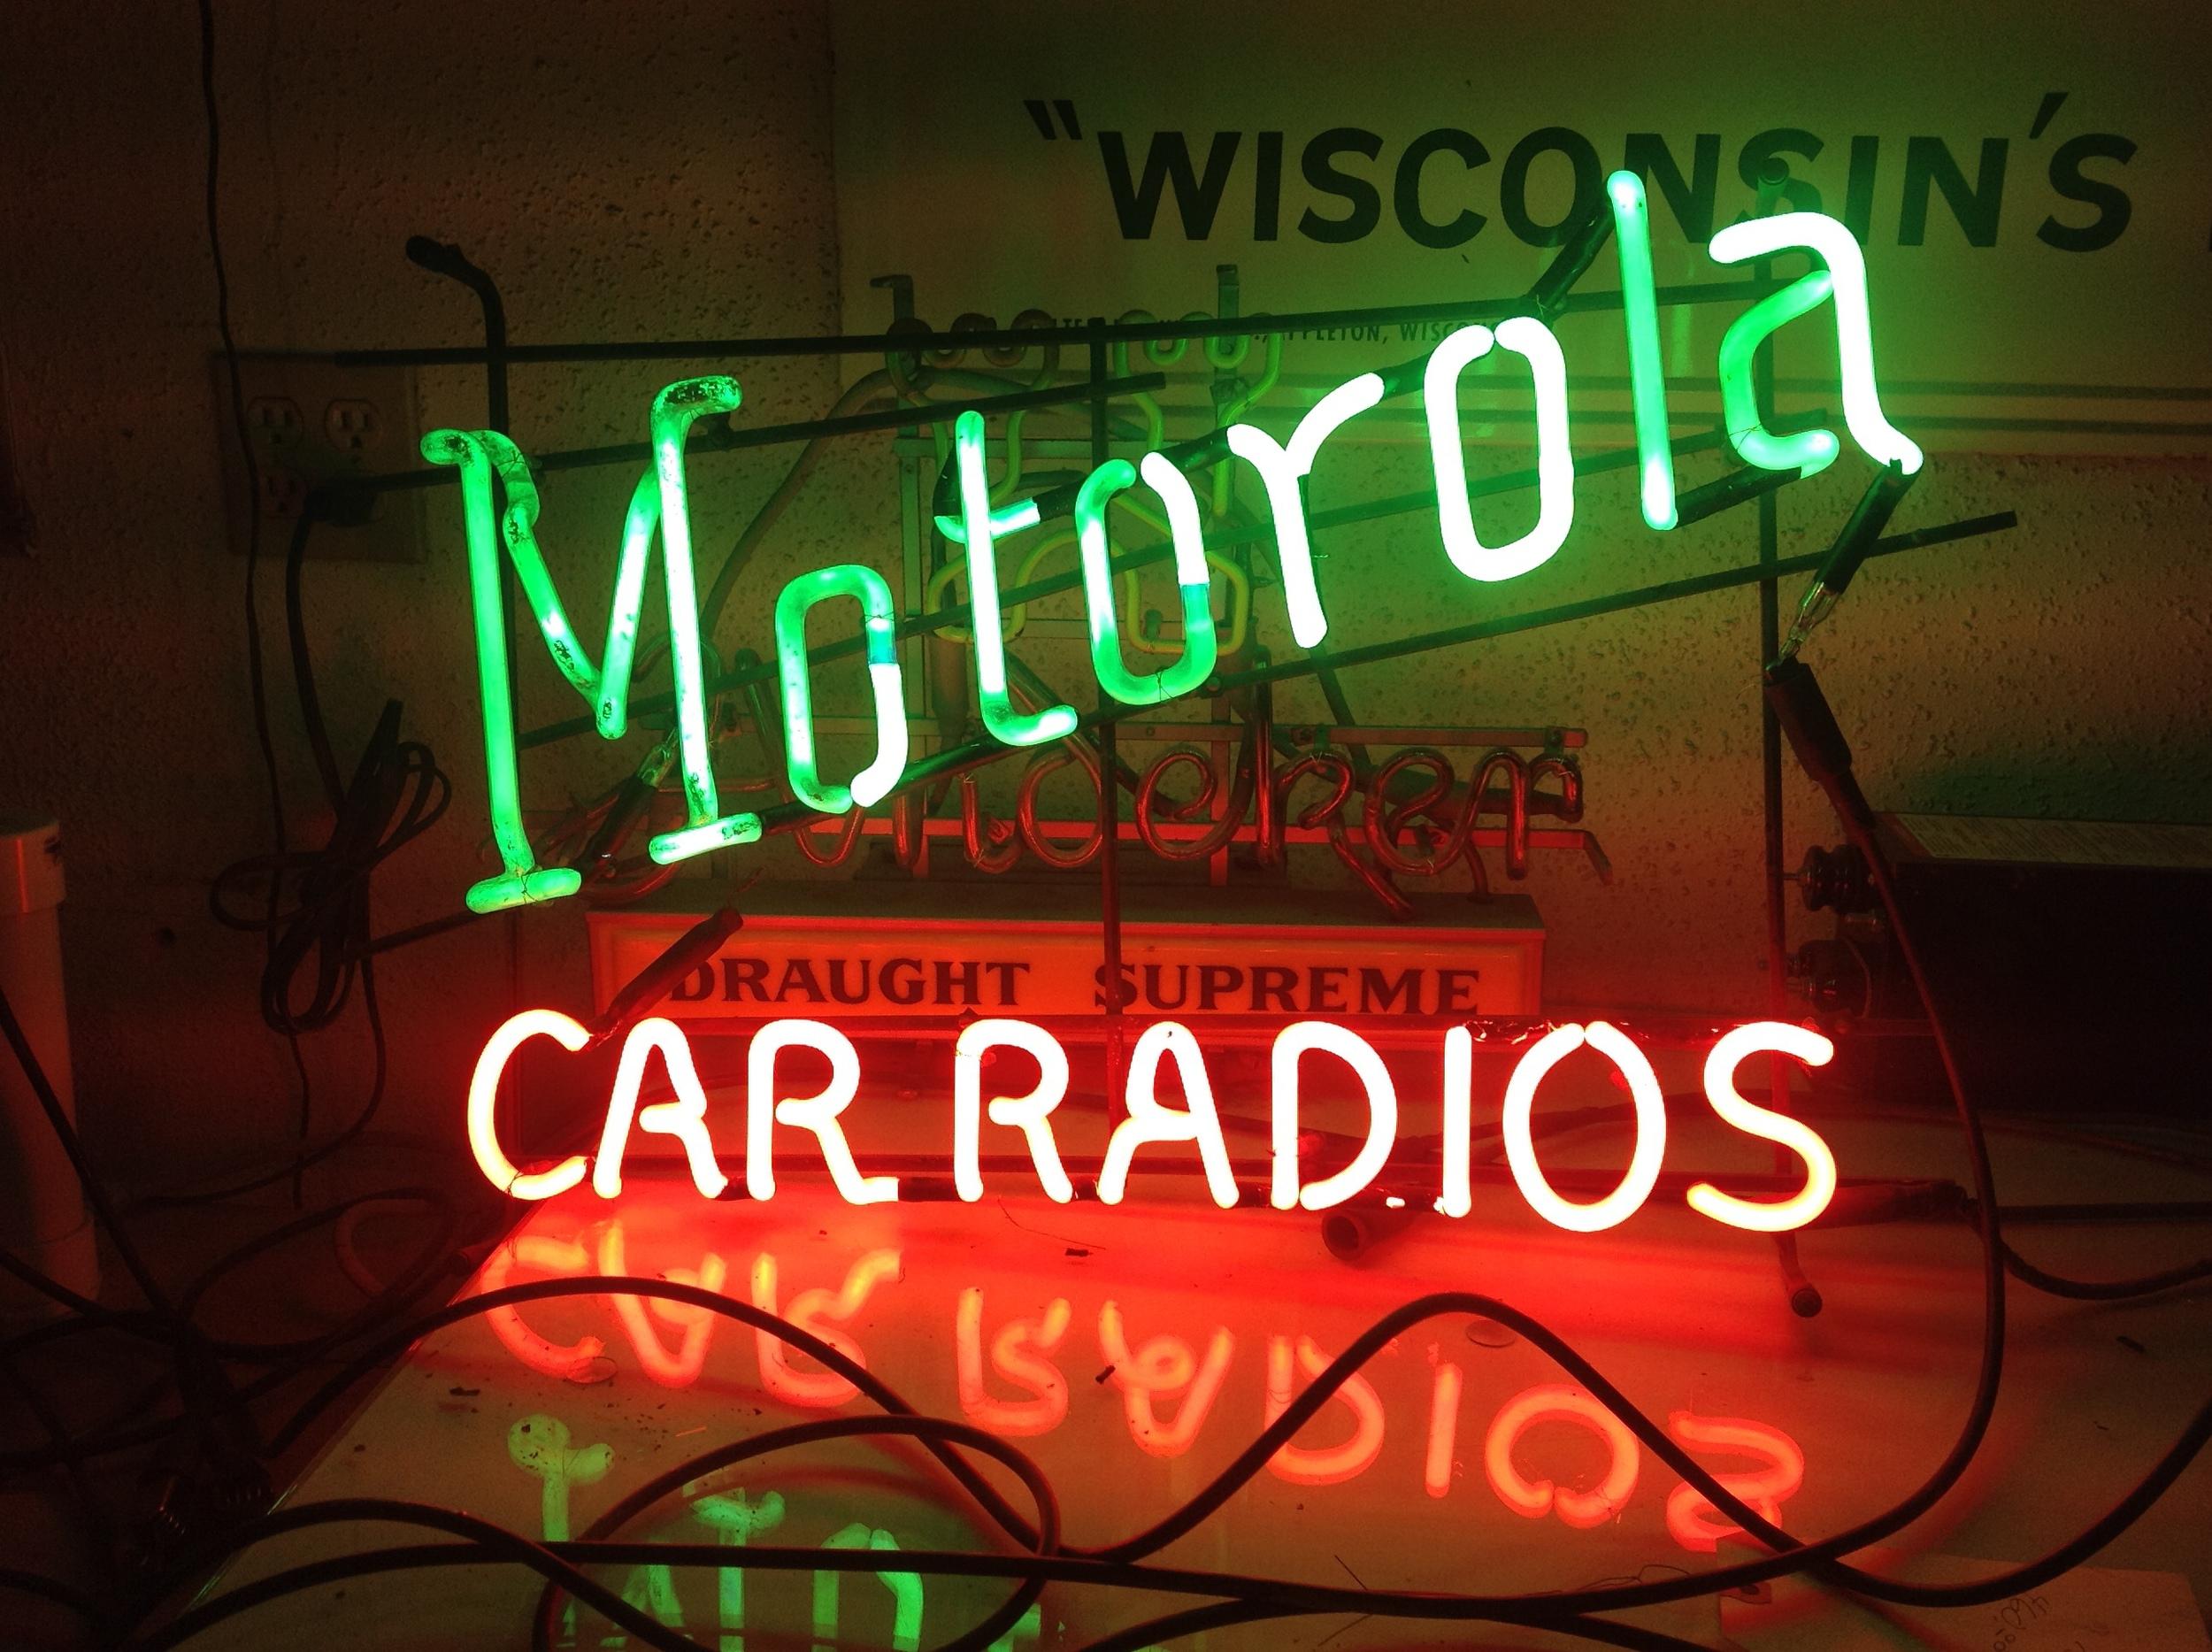 Motorola Car Radios - Neon